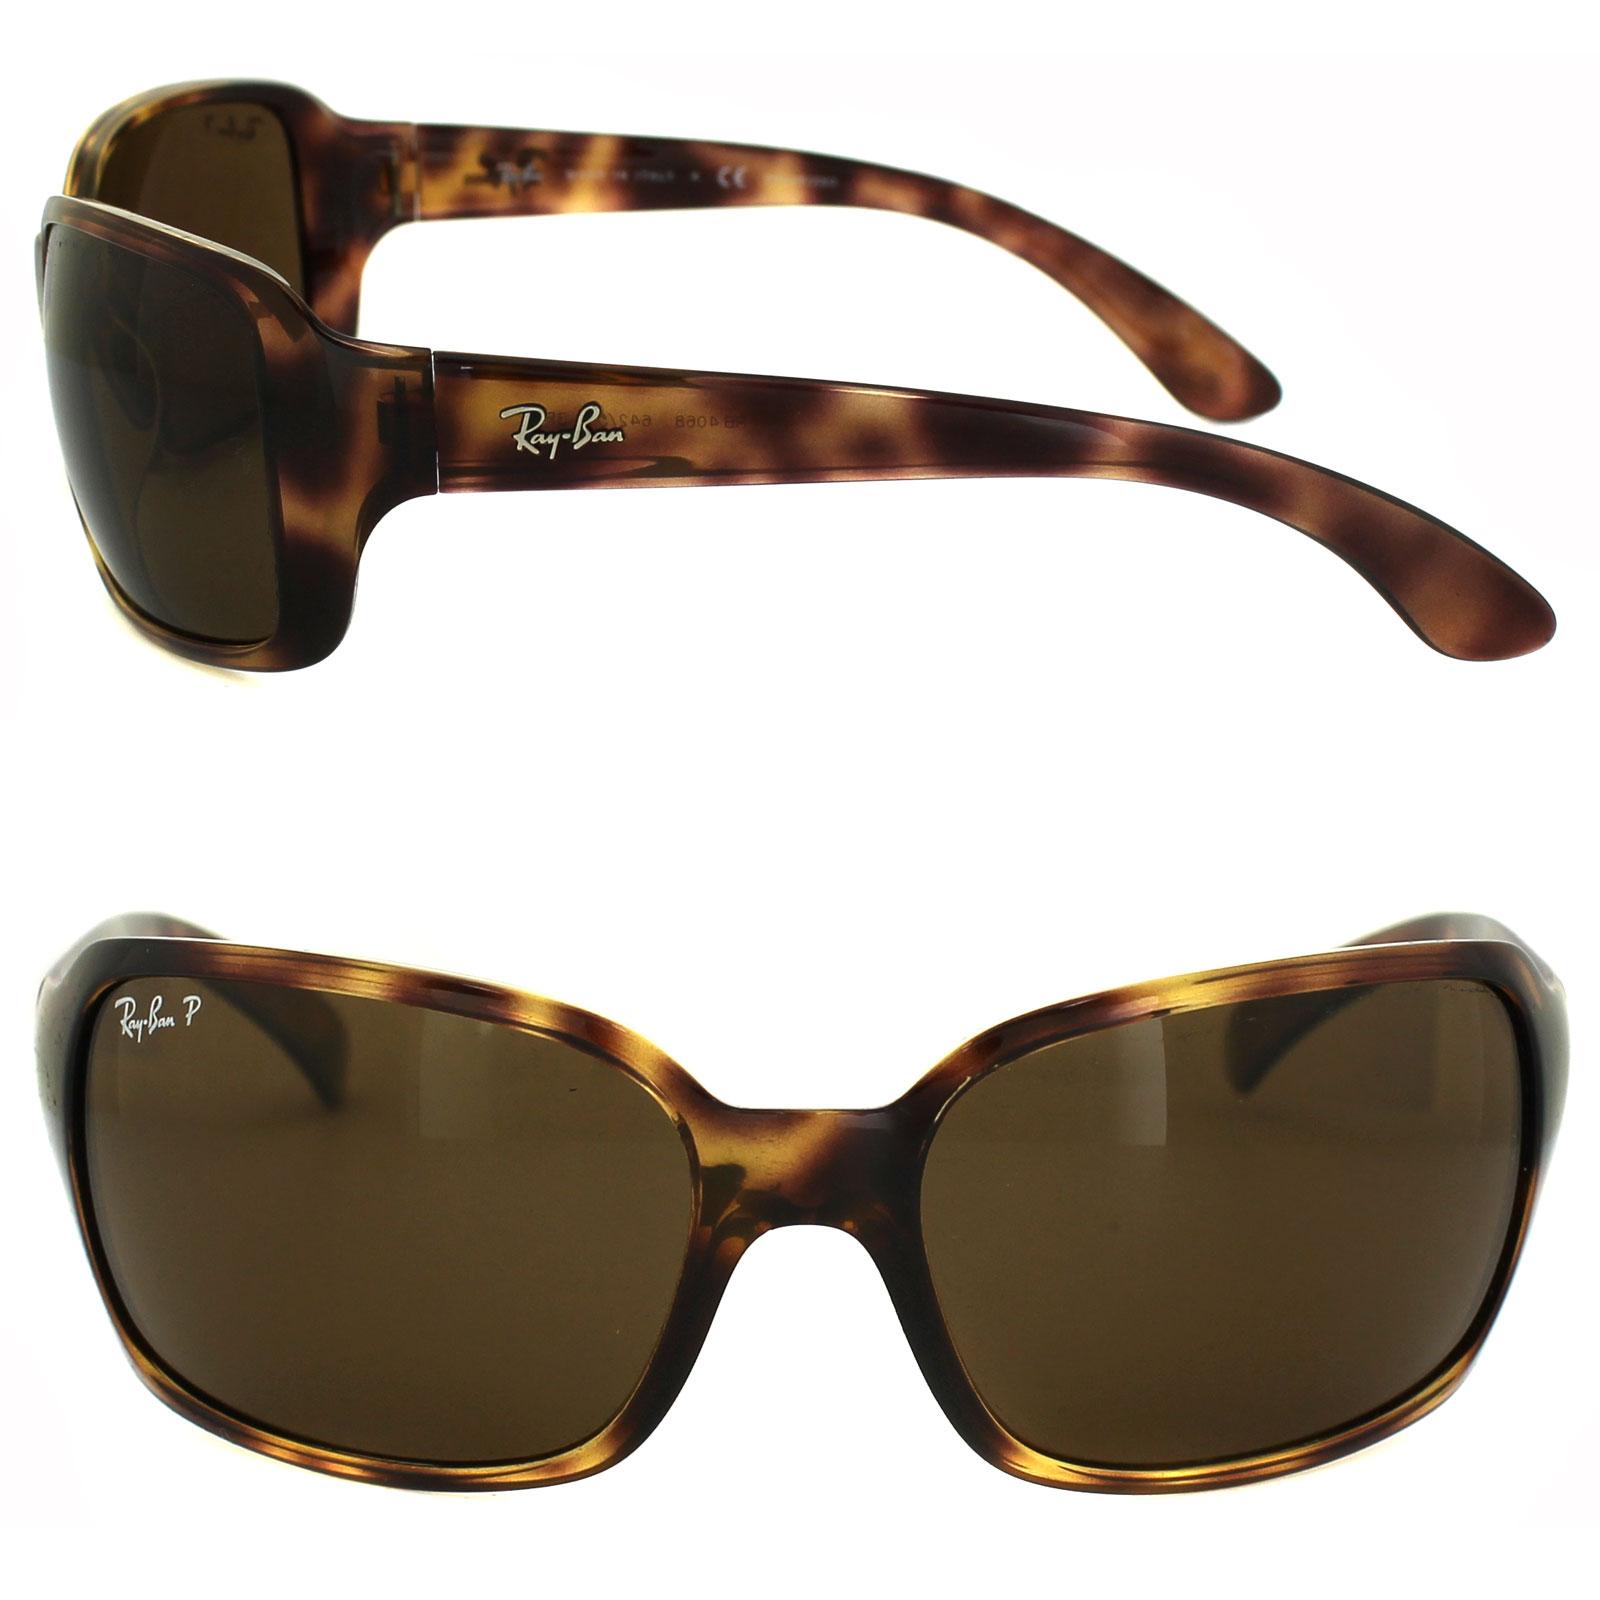 Cheap Ray Ban 4068 Sunglasses Discounted Sunglasses